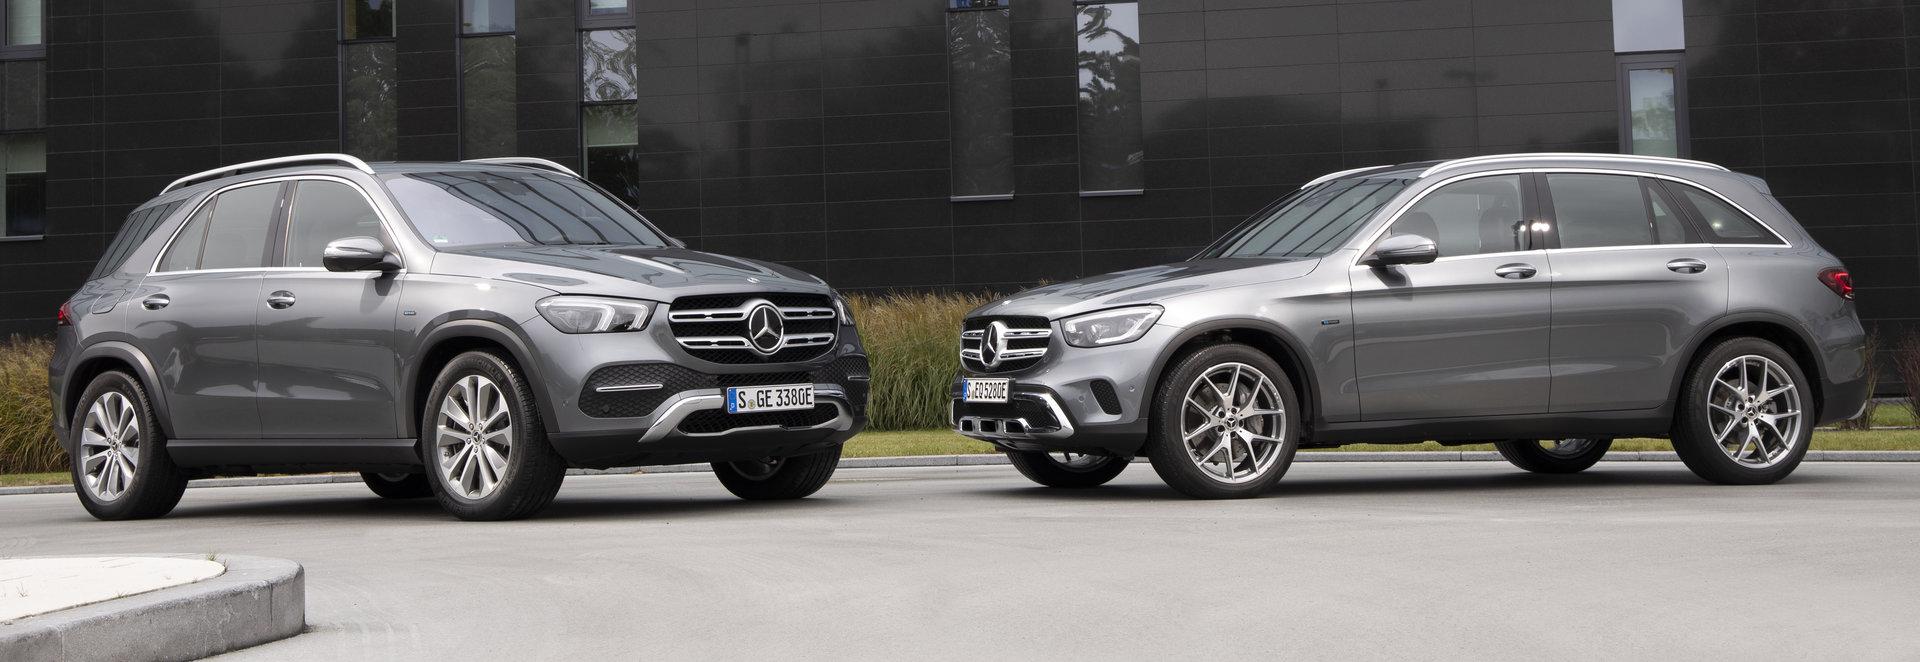 Nuevos híbridos de Mercedes-Benz, GLE 350 de 4MATIC y GLC 300 e 4MATIC